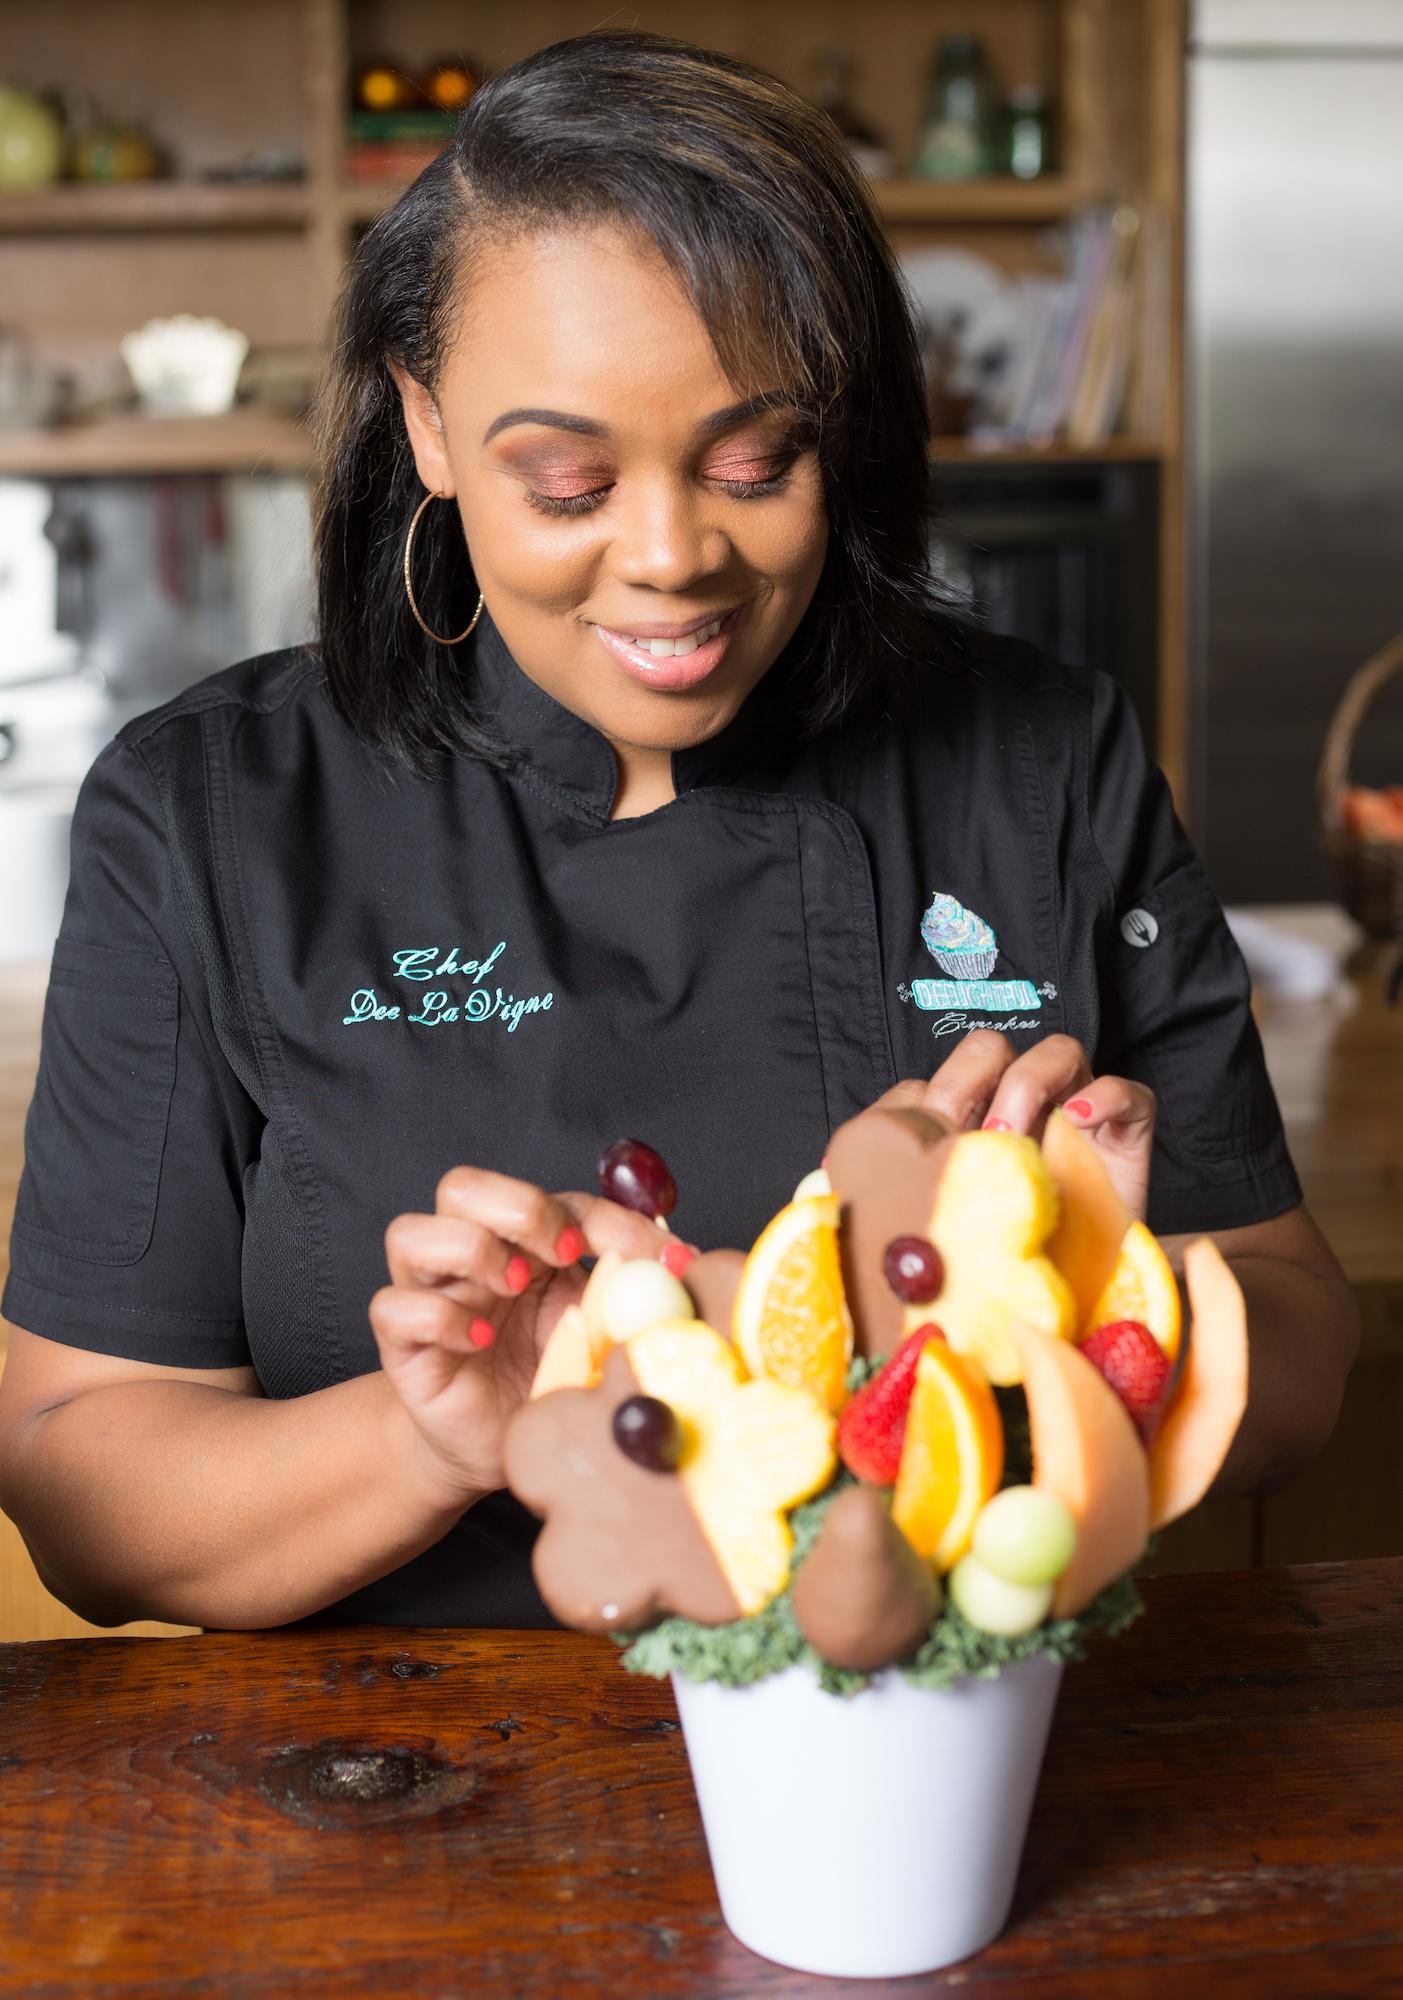 Chef Dee Lavigne from Deelightful Desserts